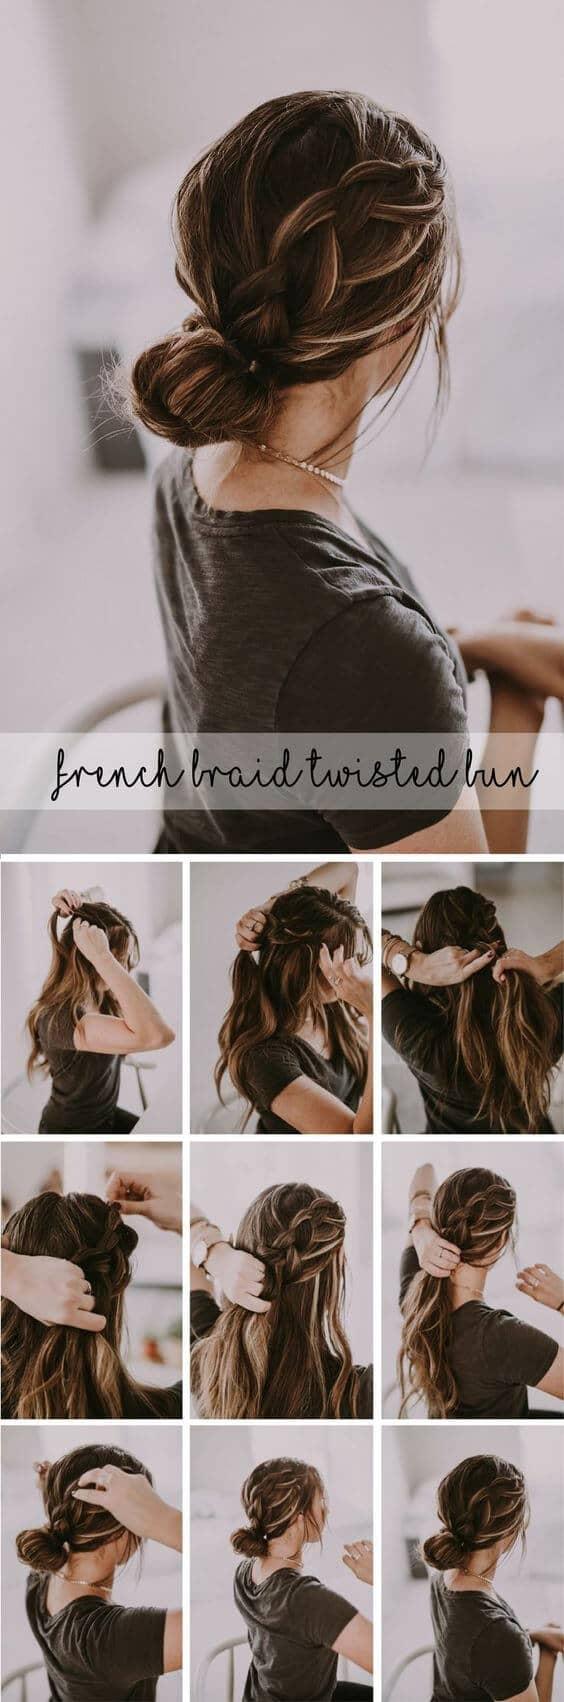 Side Braid and a Bun